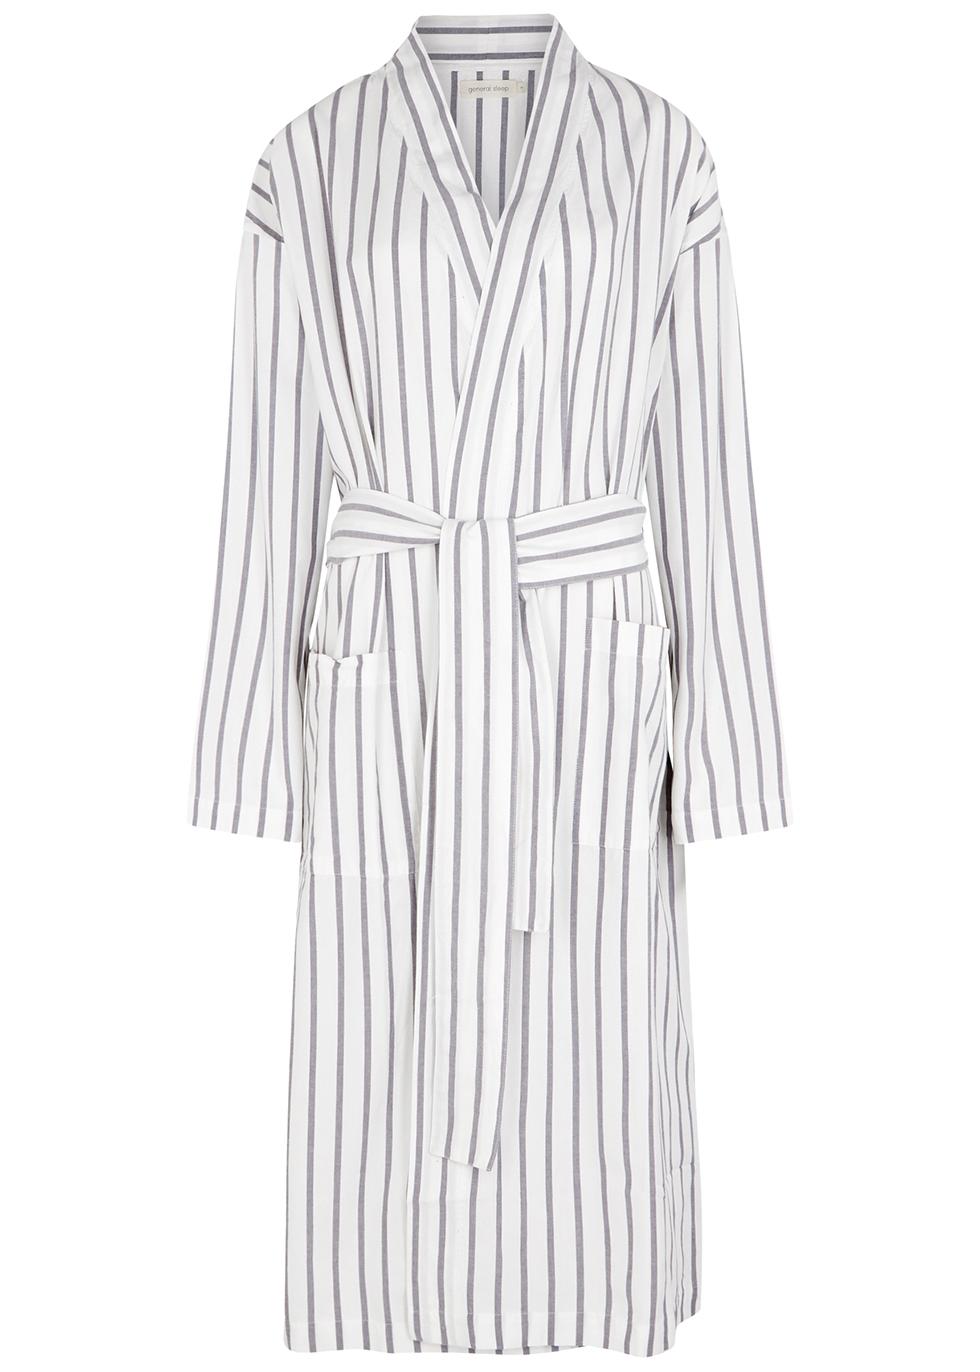 Everyone white striped cotton robe